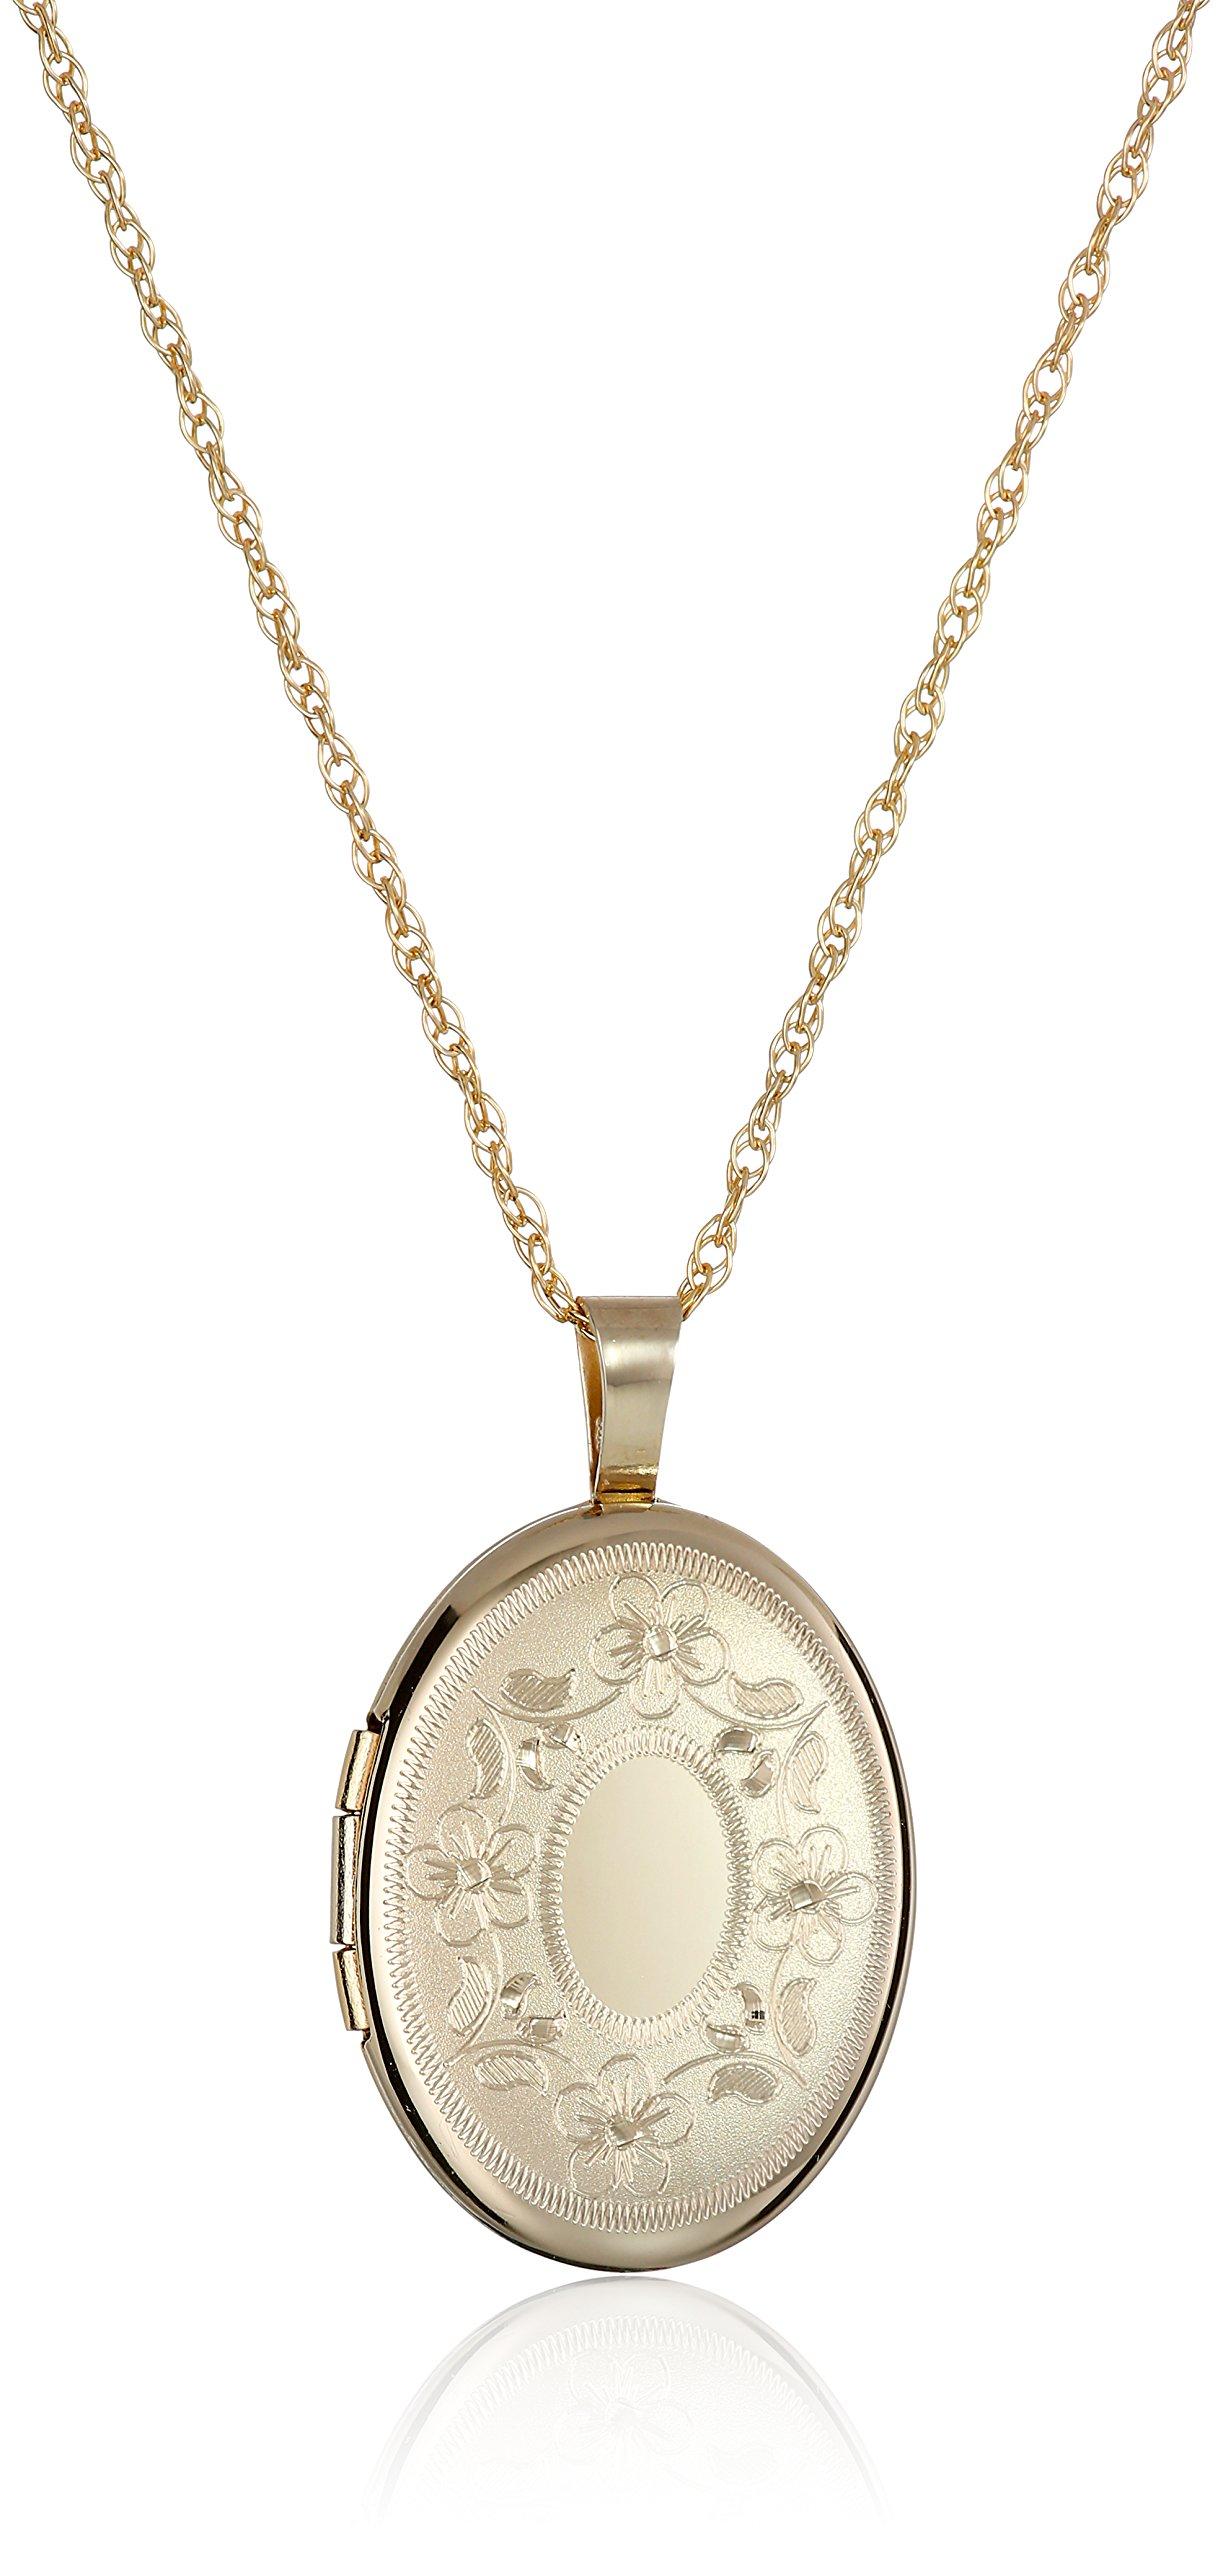 14k Gold-Filled with Floral Design and Center Signet Oval Hand Engraved Locket Necklace, 18''